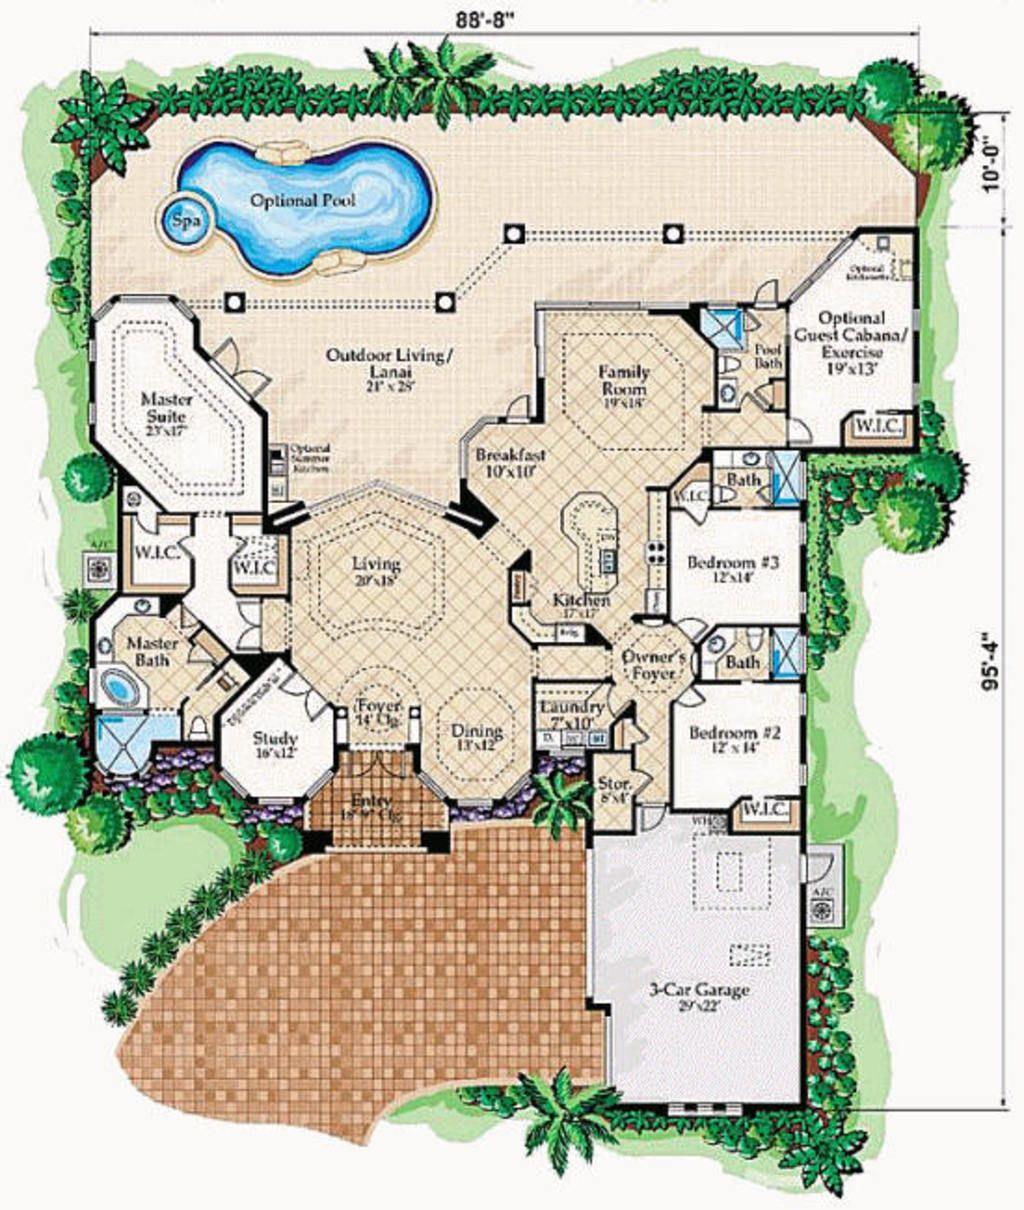 Mediterranean Style House Plan 4 Beds 4 5 Baths 3650 Sq Ft Plan 27 229 Florida House Plans Mediterranean House Plans Mediterranean Style House Plans